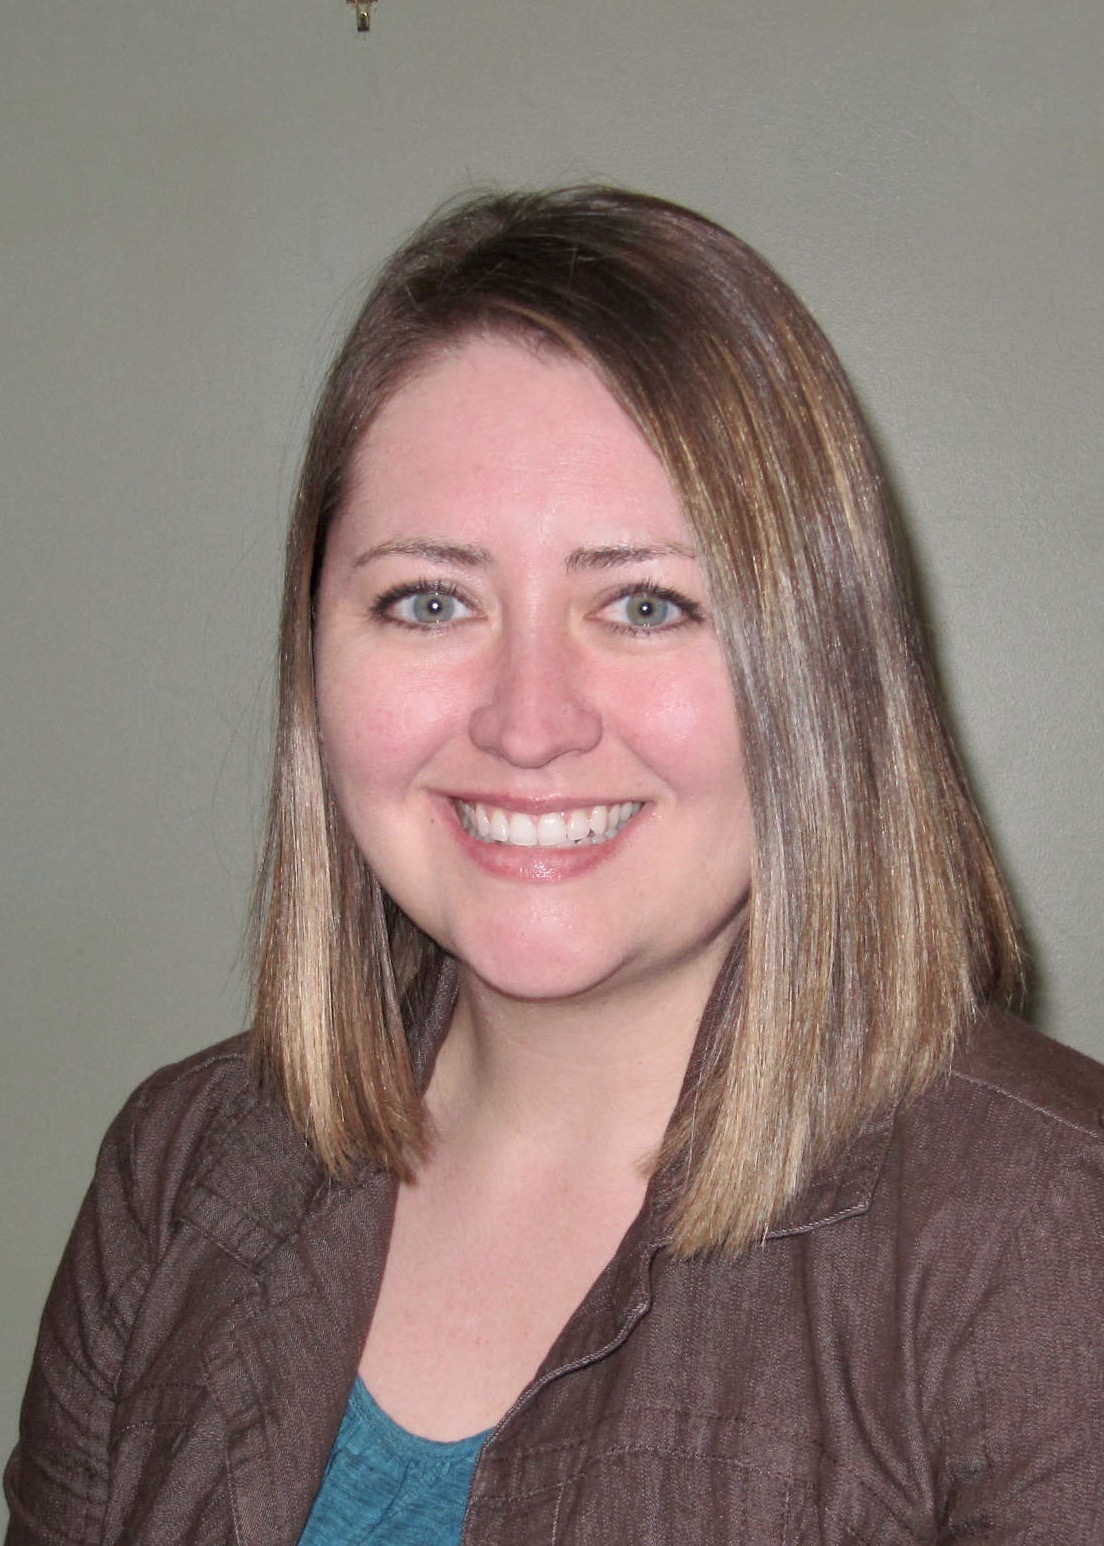 West Bloomfield MI Counselor, Therapist Kristen Sawyer, LLPC